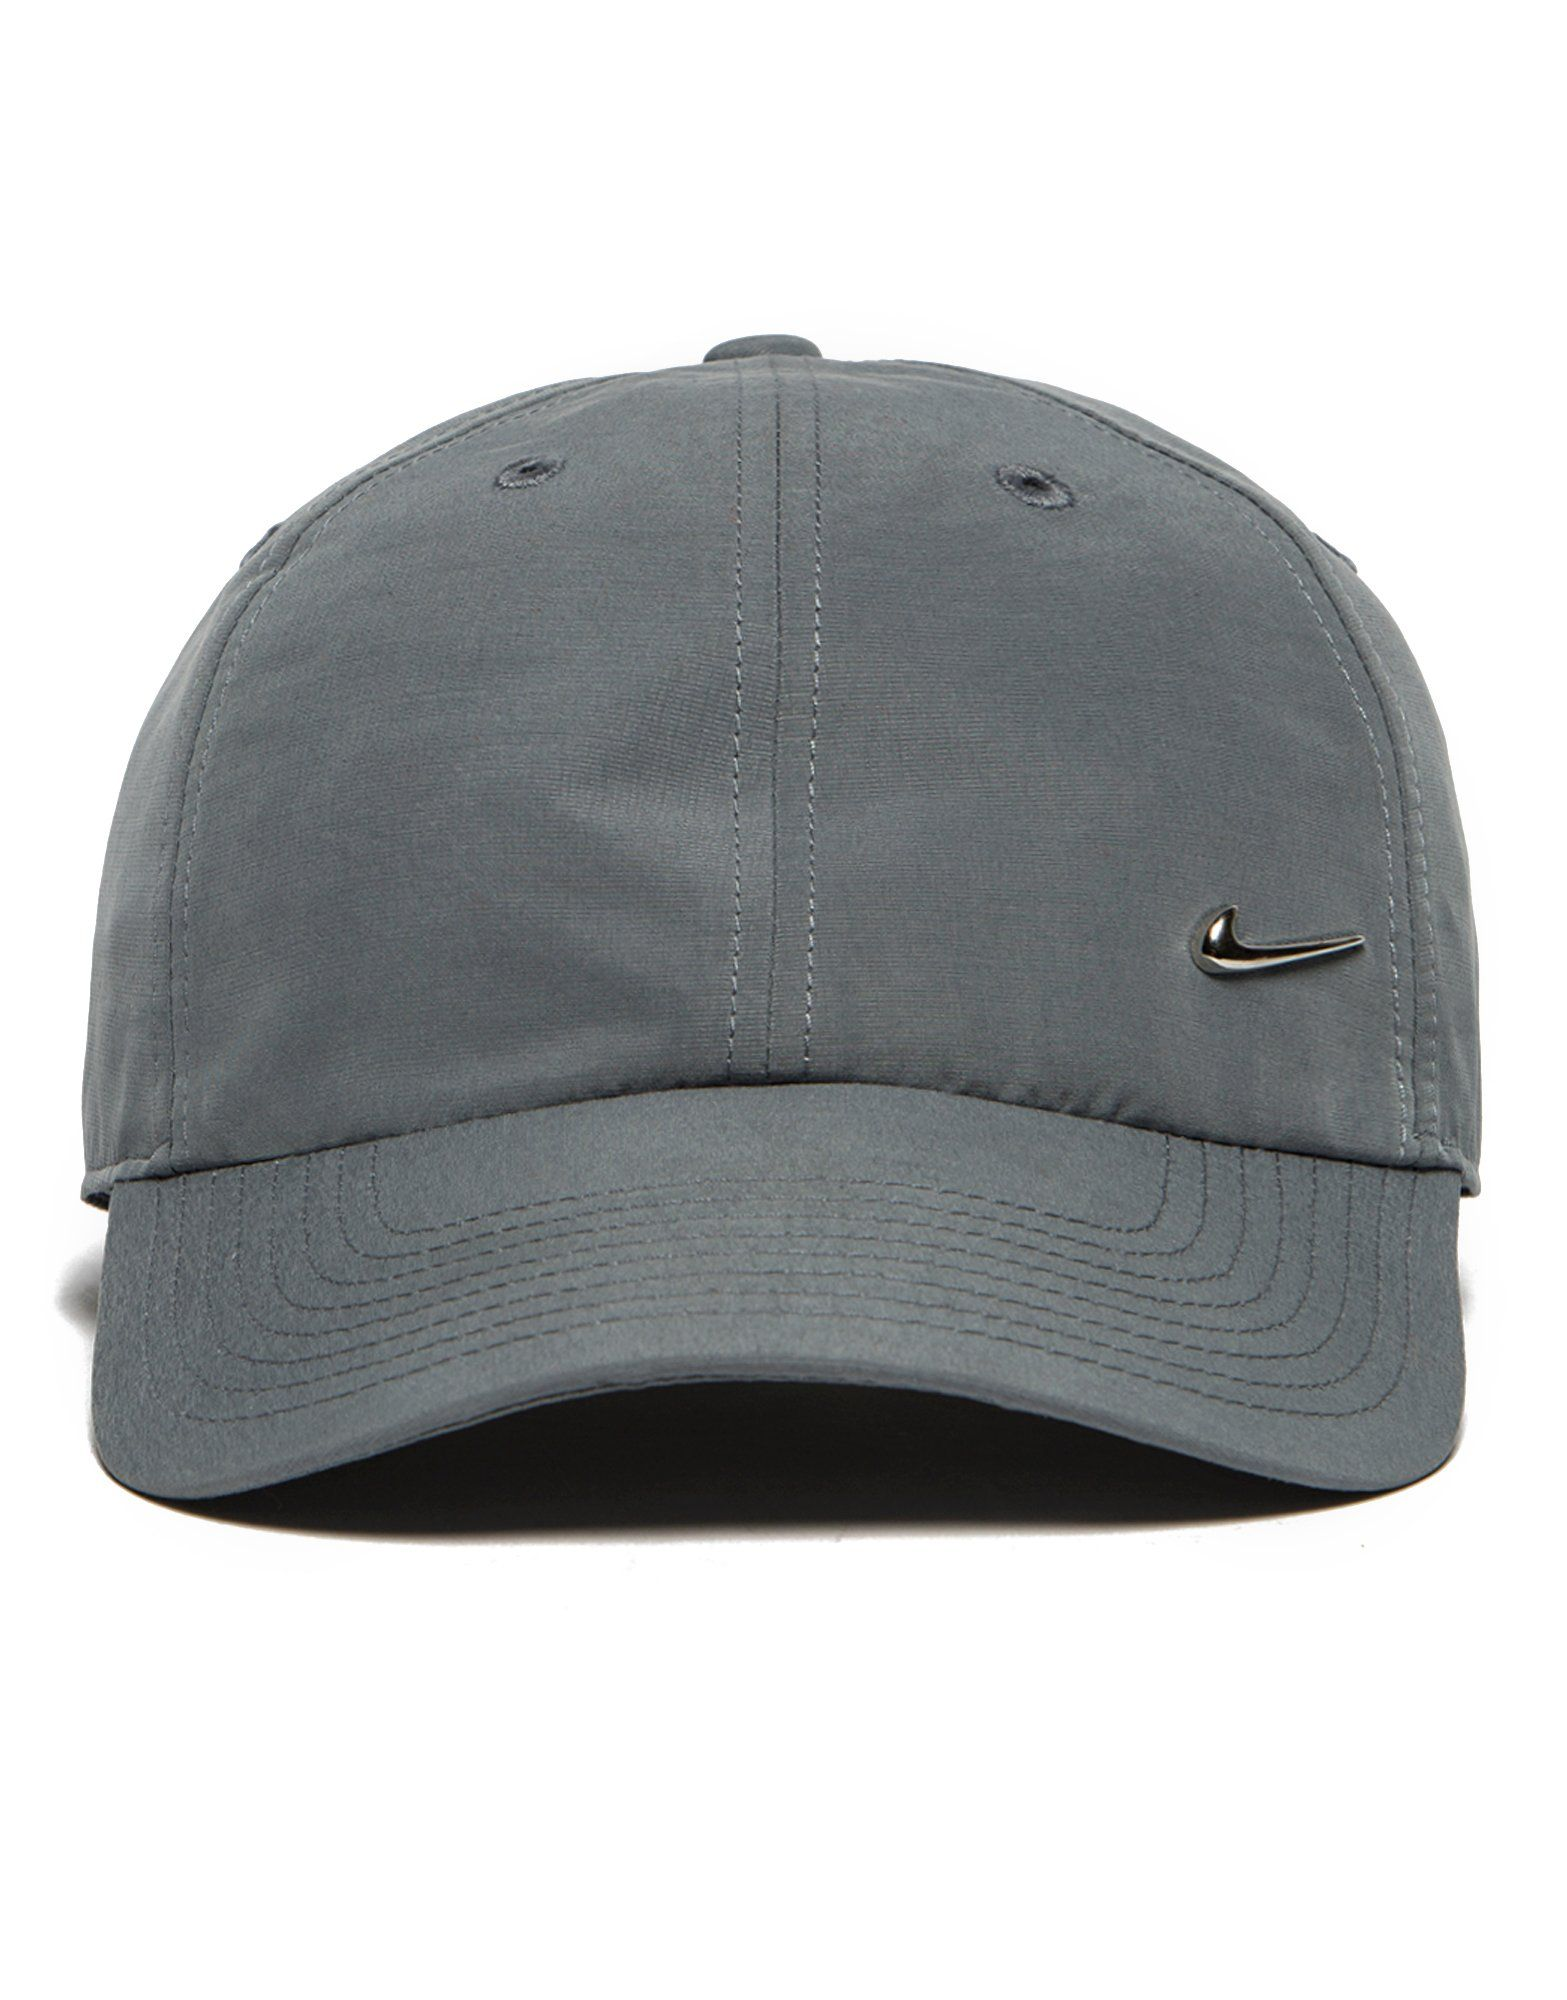 nike sb woodgrain bucket hat mens backpack gray large; nike side swoosh cap